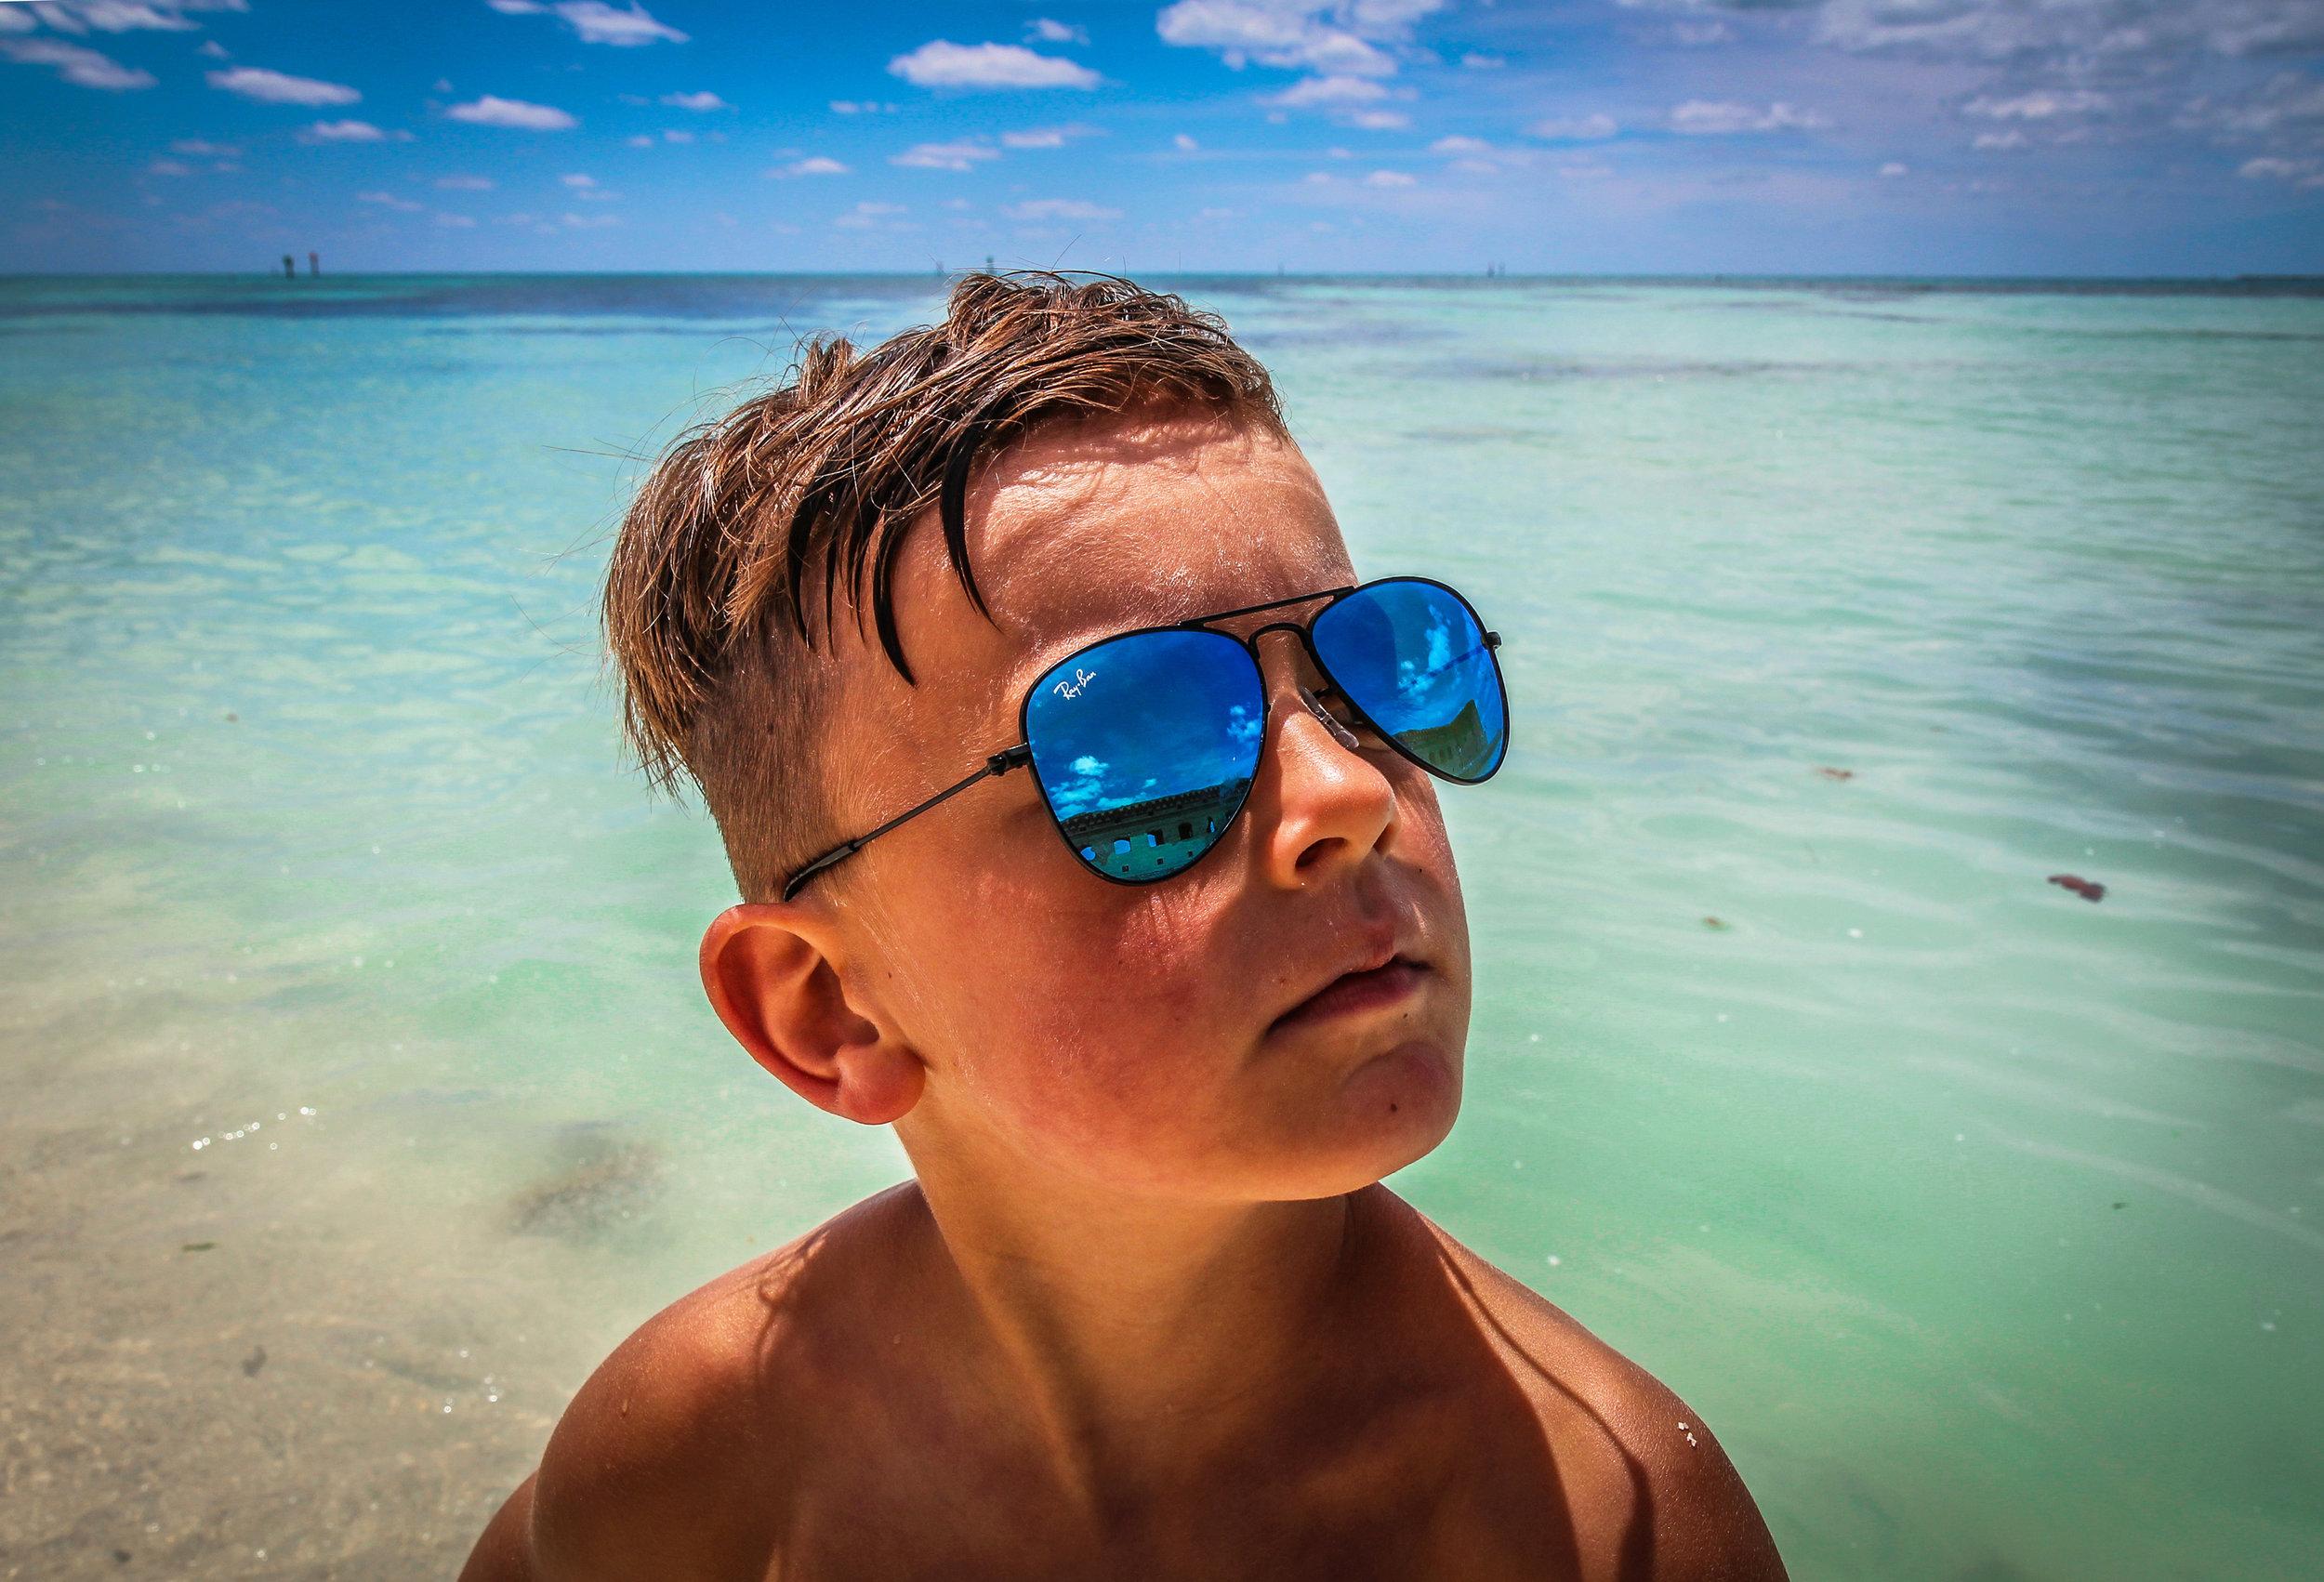 Key_west_Dry_tortugas_Yankee_freedom_Reizen_met_kinderen_Florida-17a.jpg